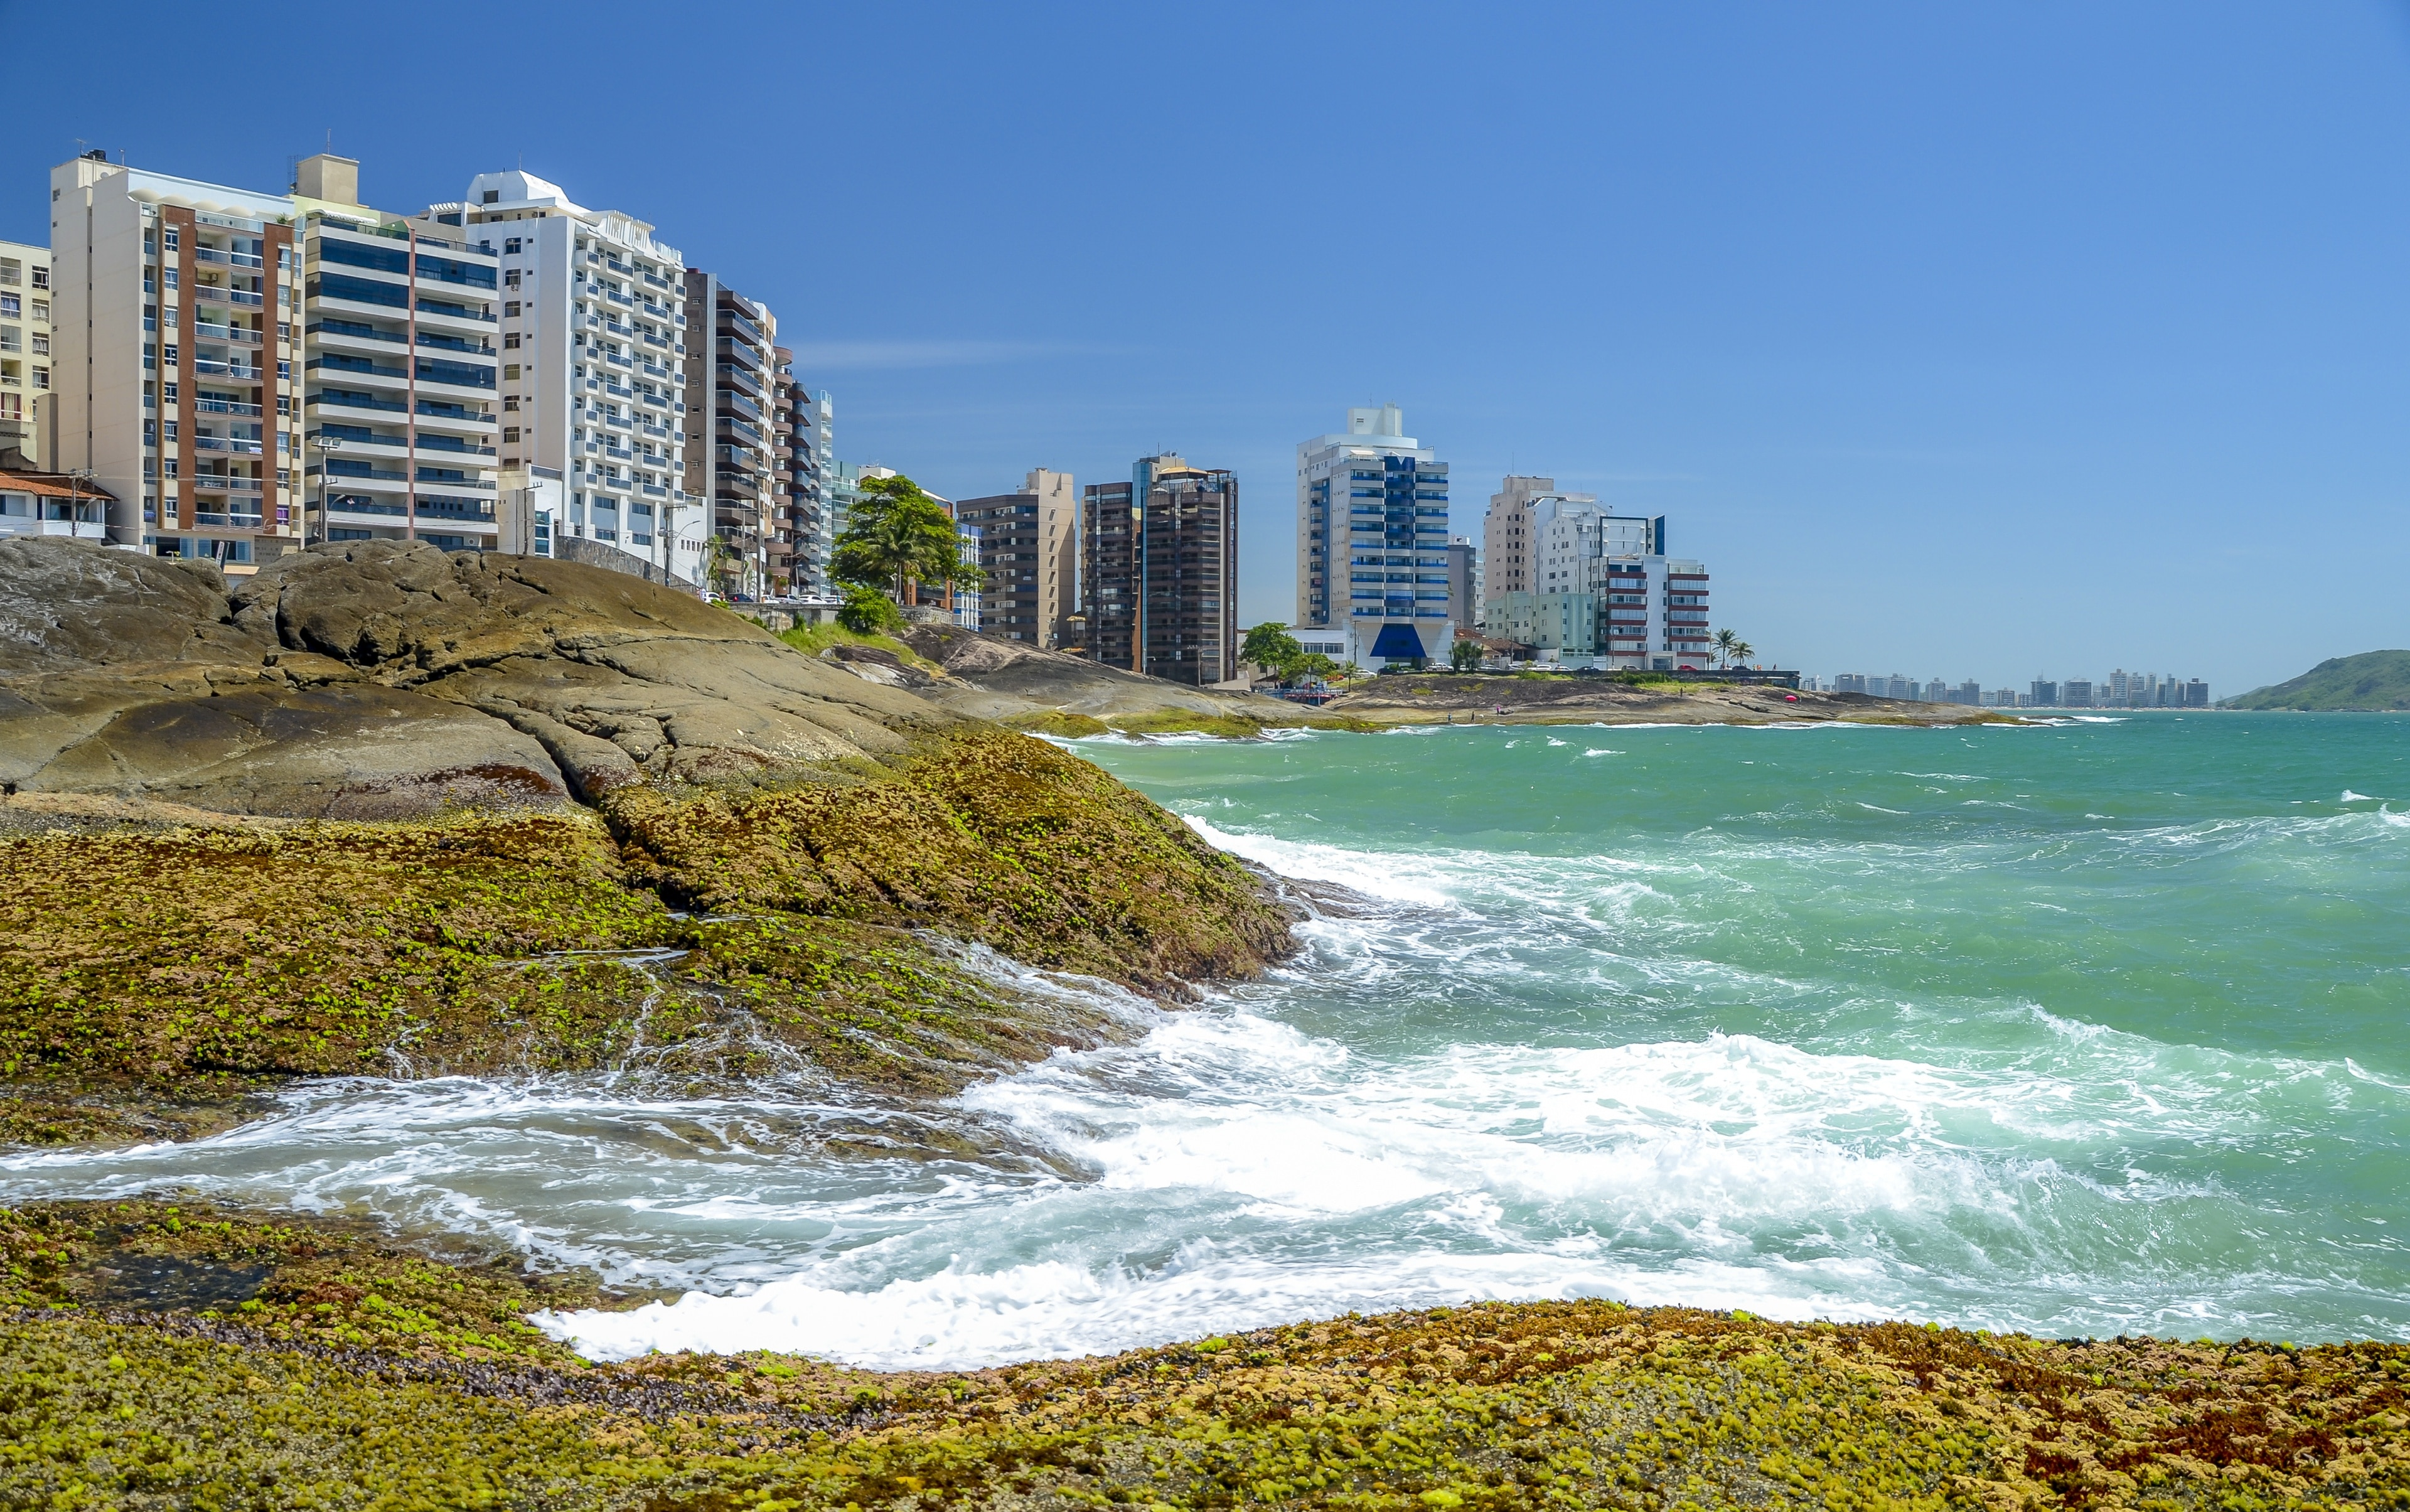 Bundesstaat Espírito Santo, Brasilien